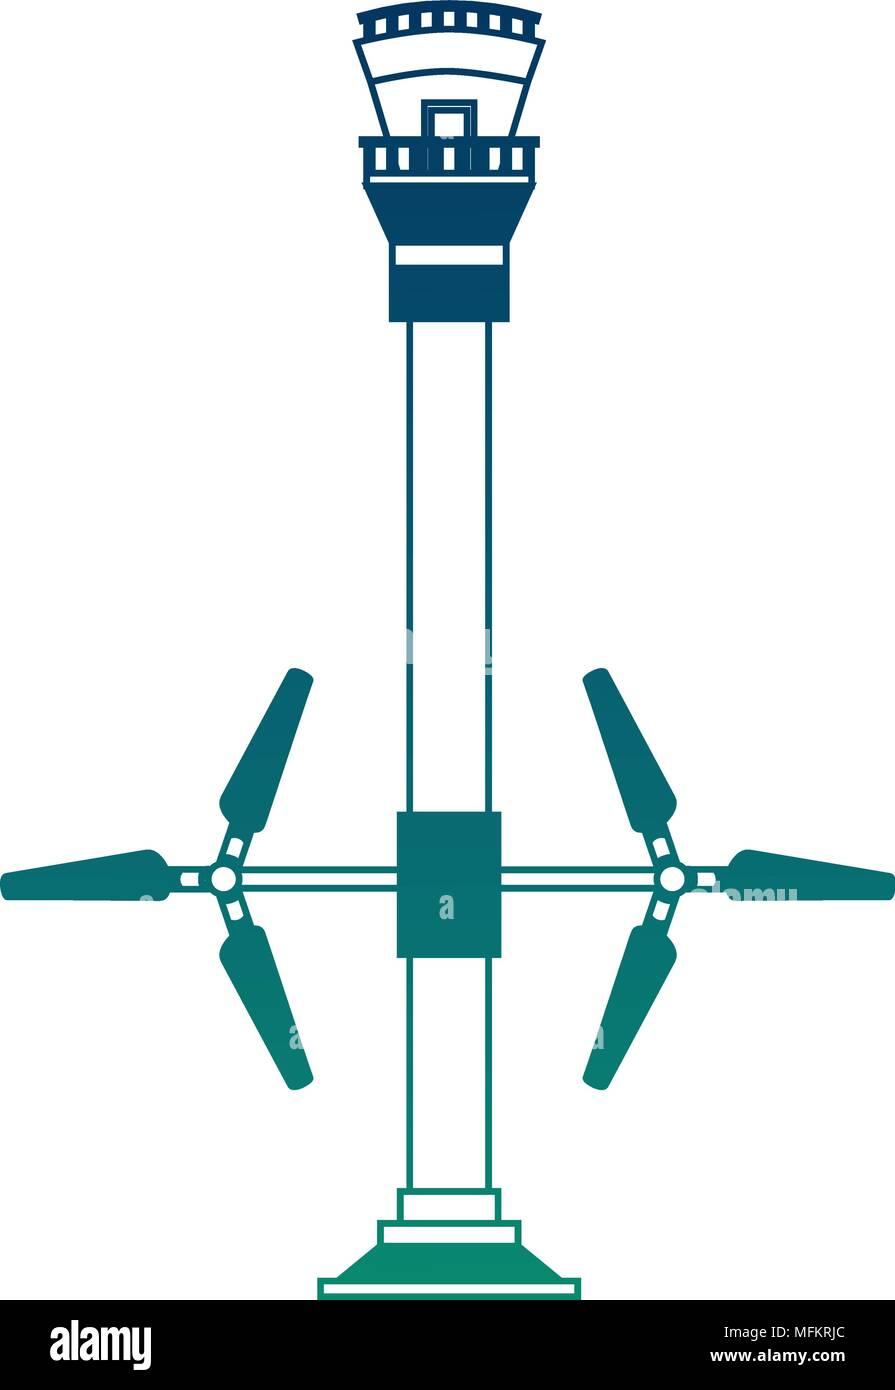 hight resolution of tidal energy station renewable alternative energy stock image